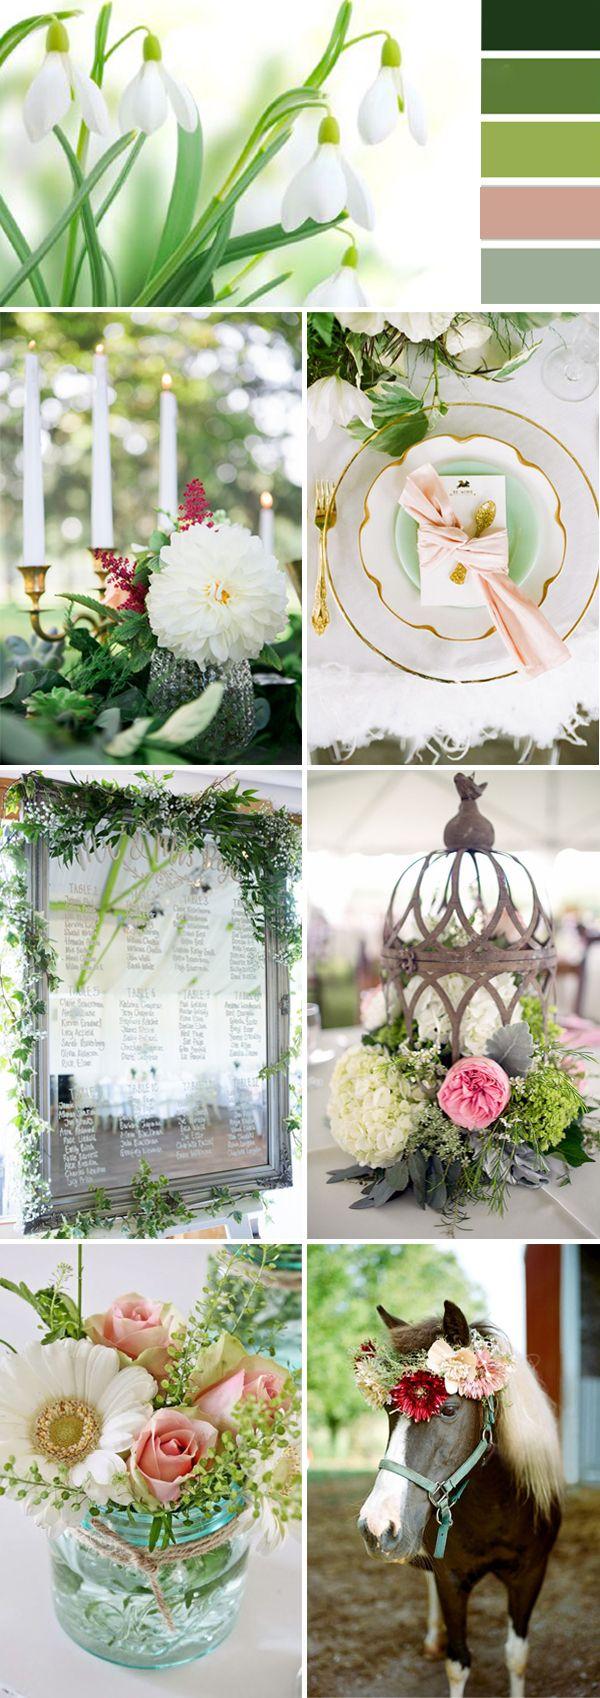 Green Wedding Color Ideas For 2017 Spring